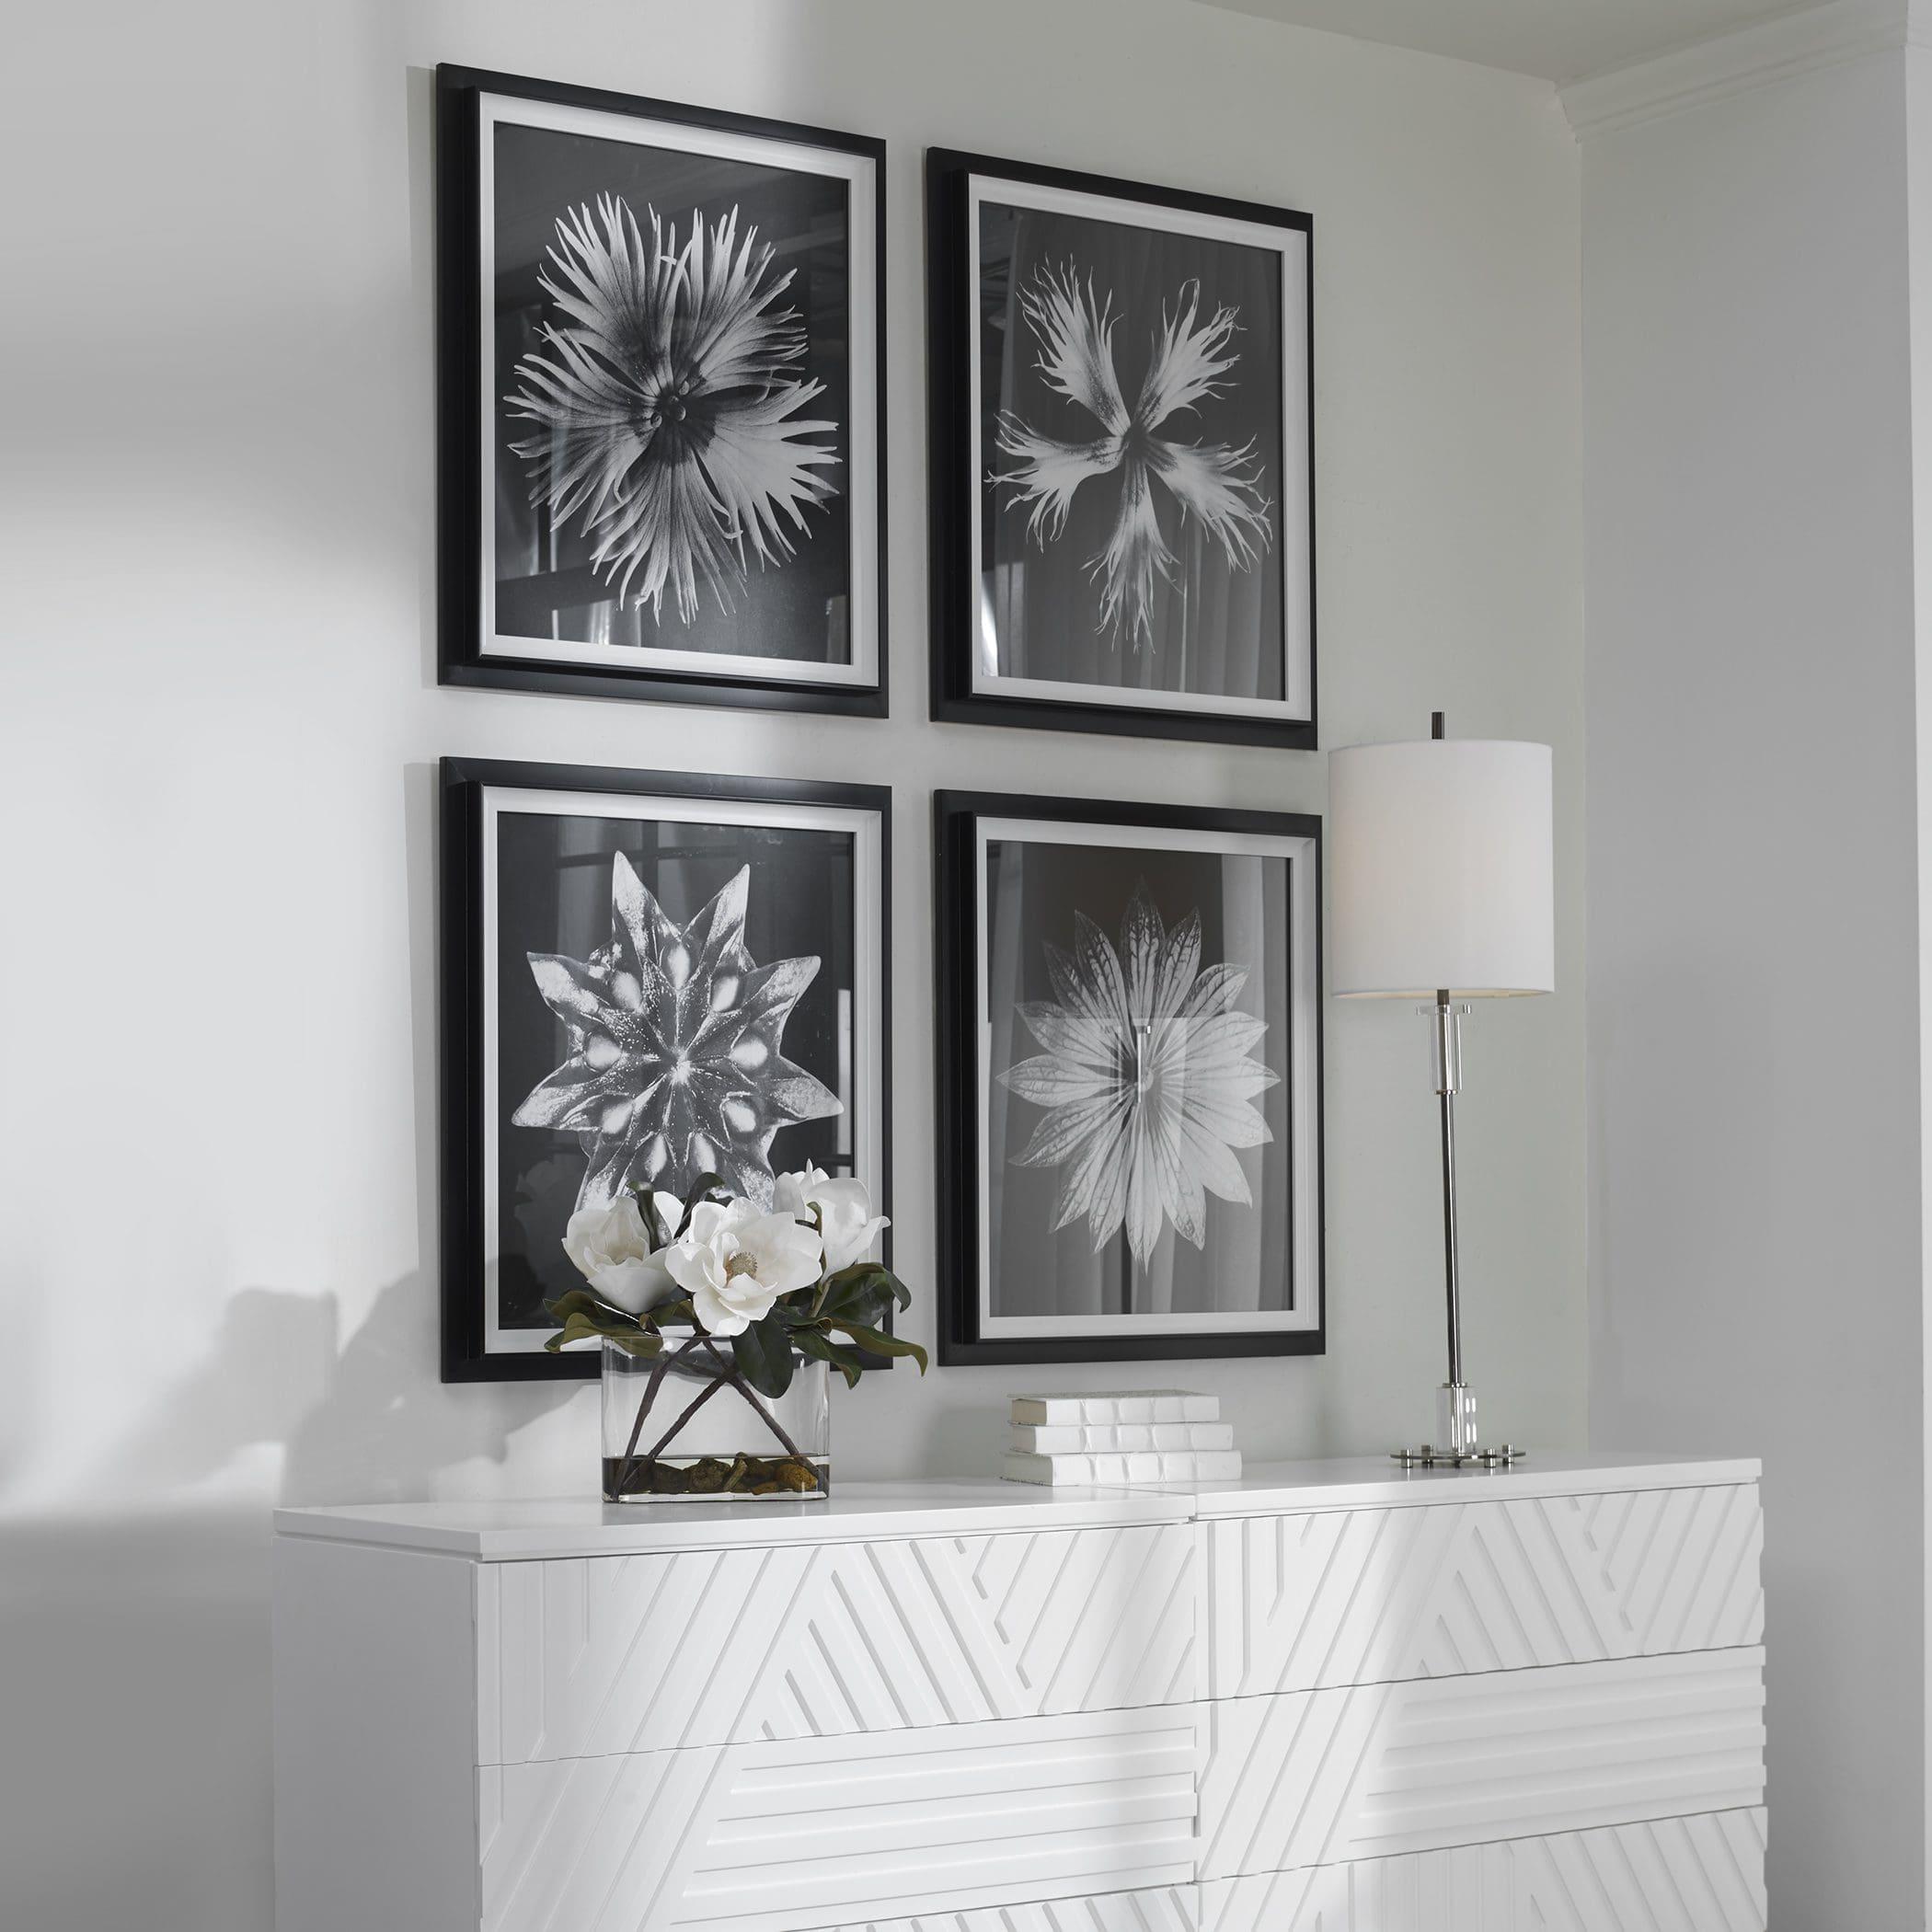 Uttermost Contemporary Floret Framed Prints, S/4